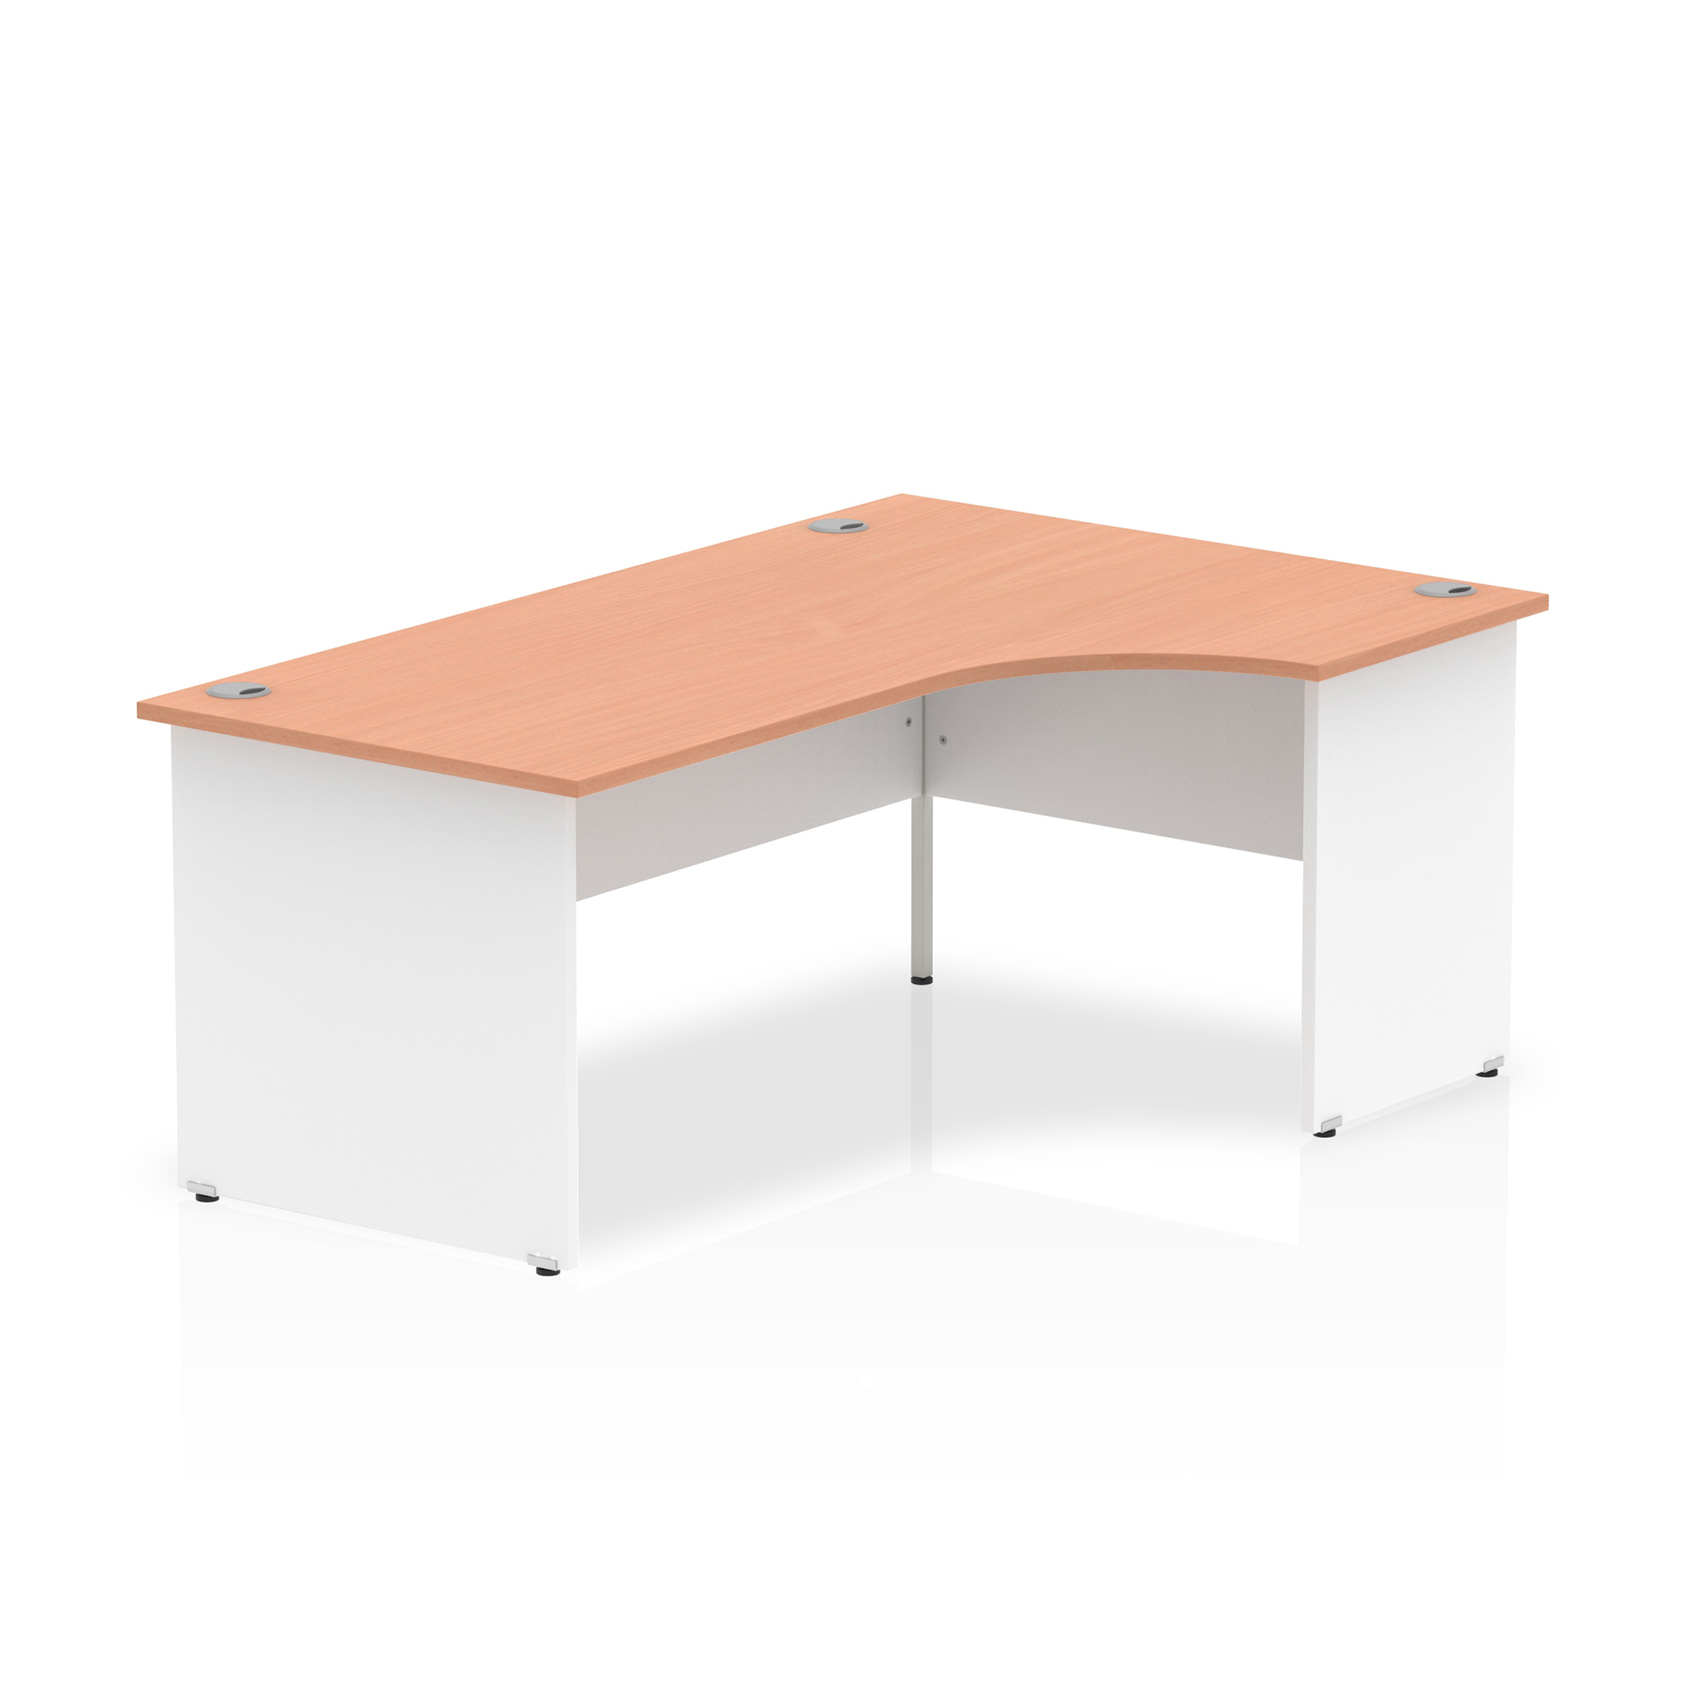 Trexus Desk Crescent Right Hand Panel End 1800x800mm Beech Top White Panels Ref TT000045